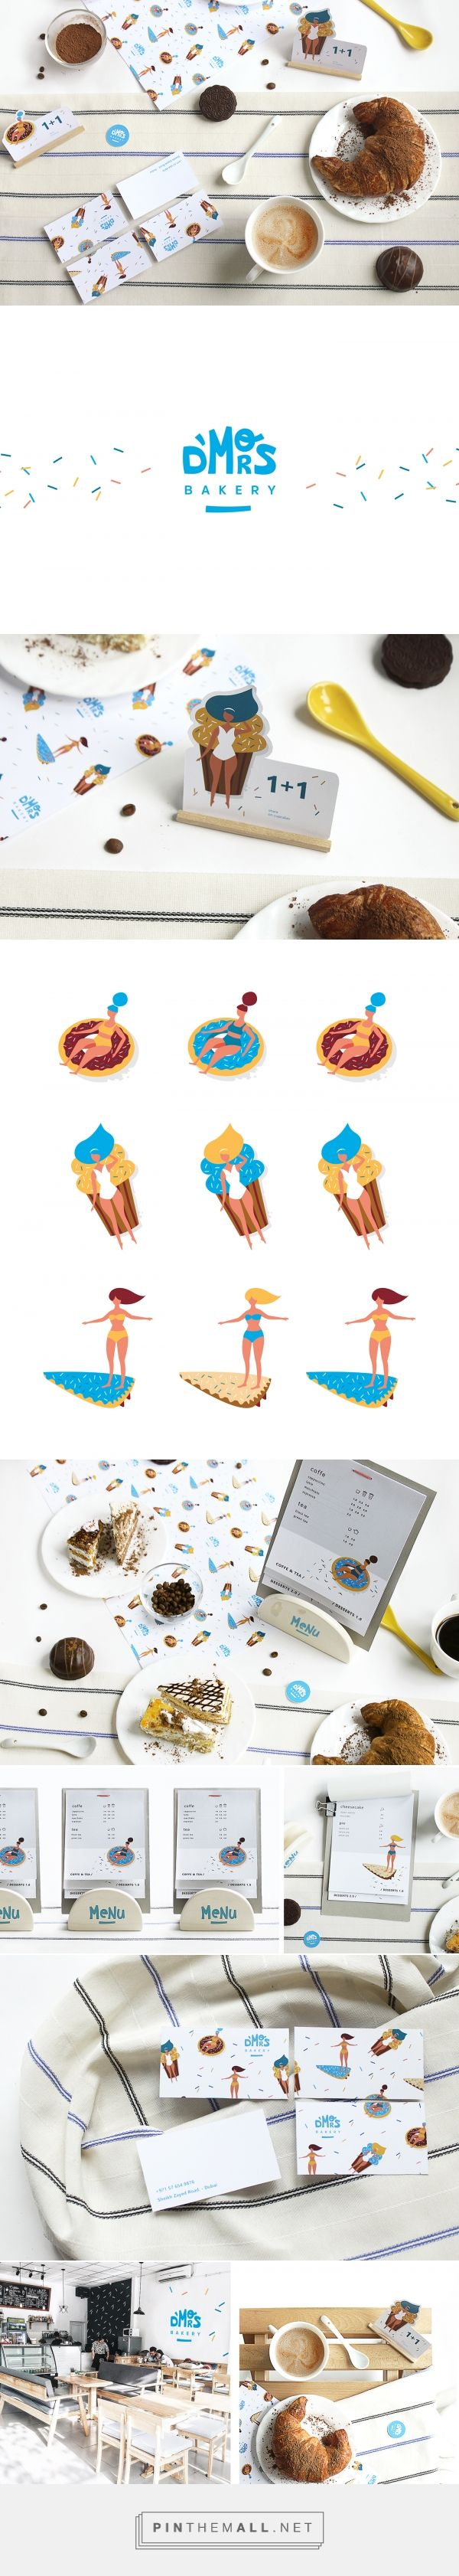 D`MORS Bakery Branding by Mariya Anfilatova   Fivestar Branding Agency – Design and Branding Agency & Curated Inspiration Gallery